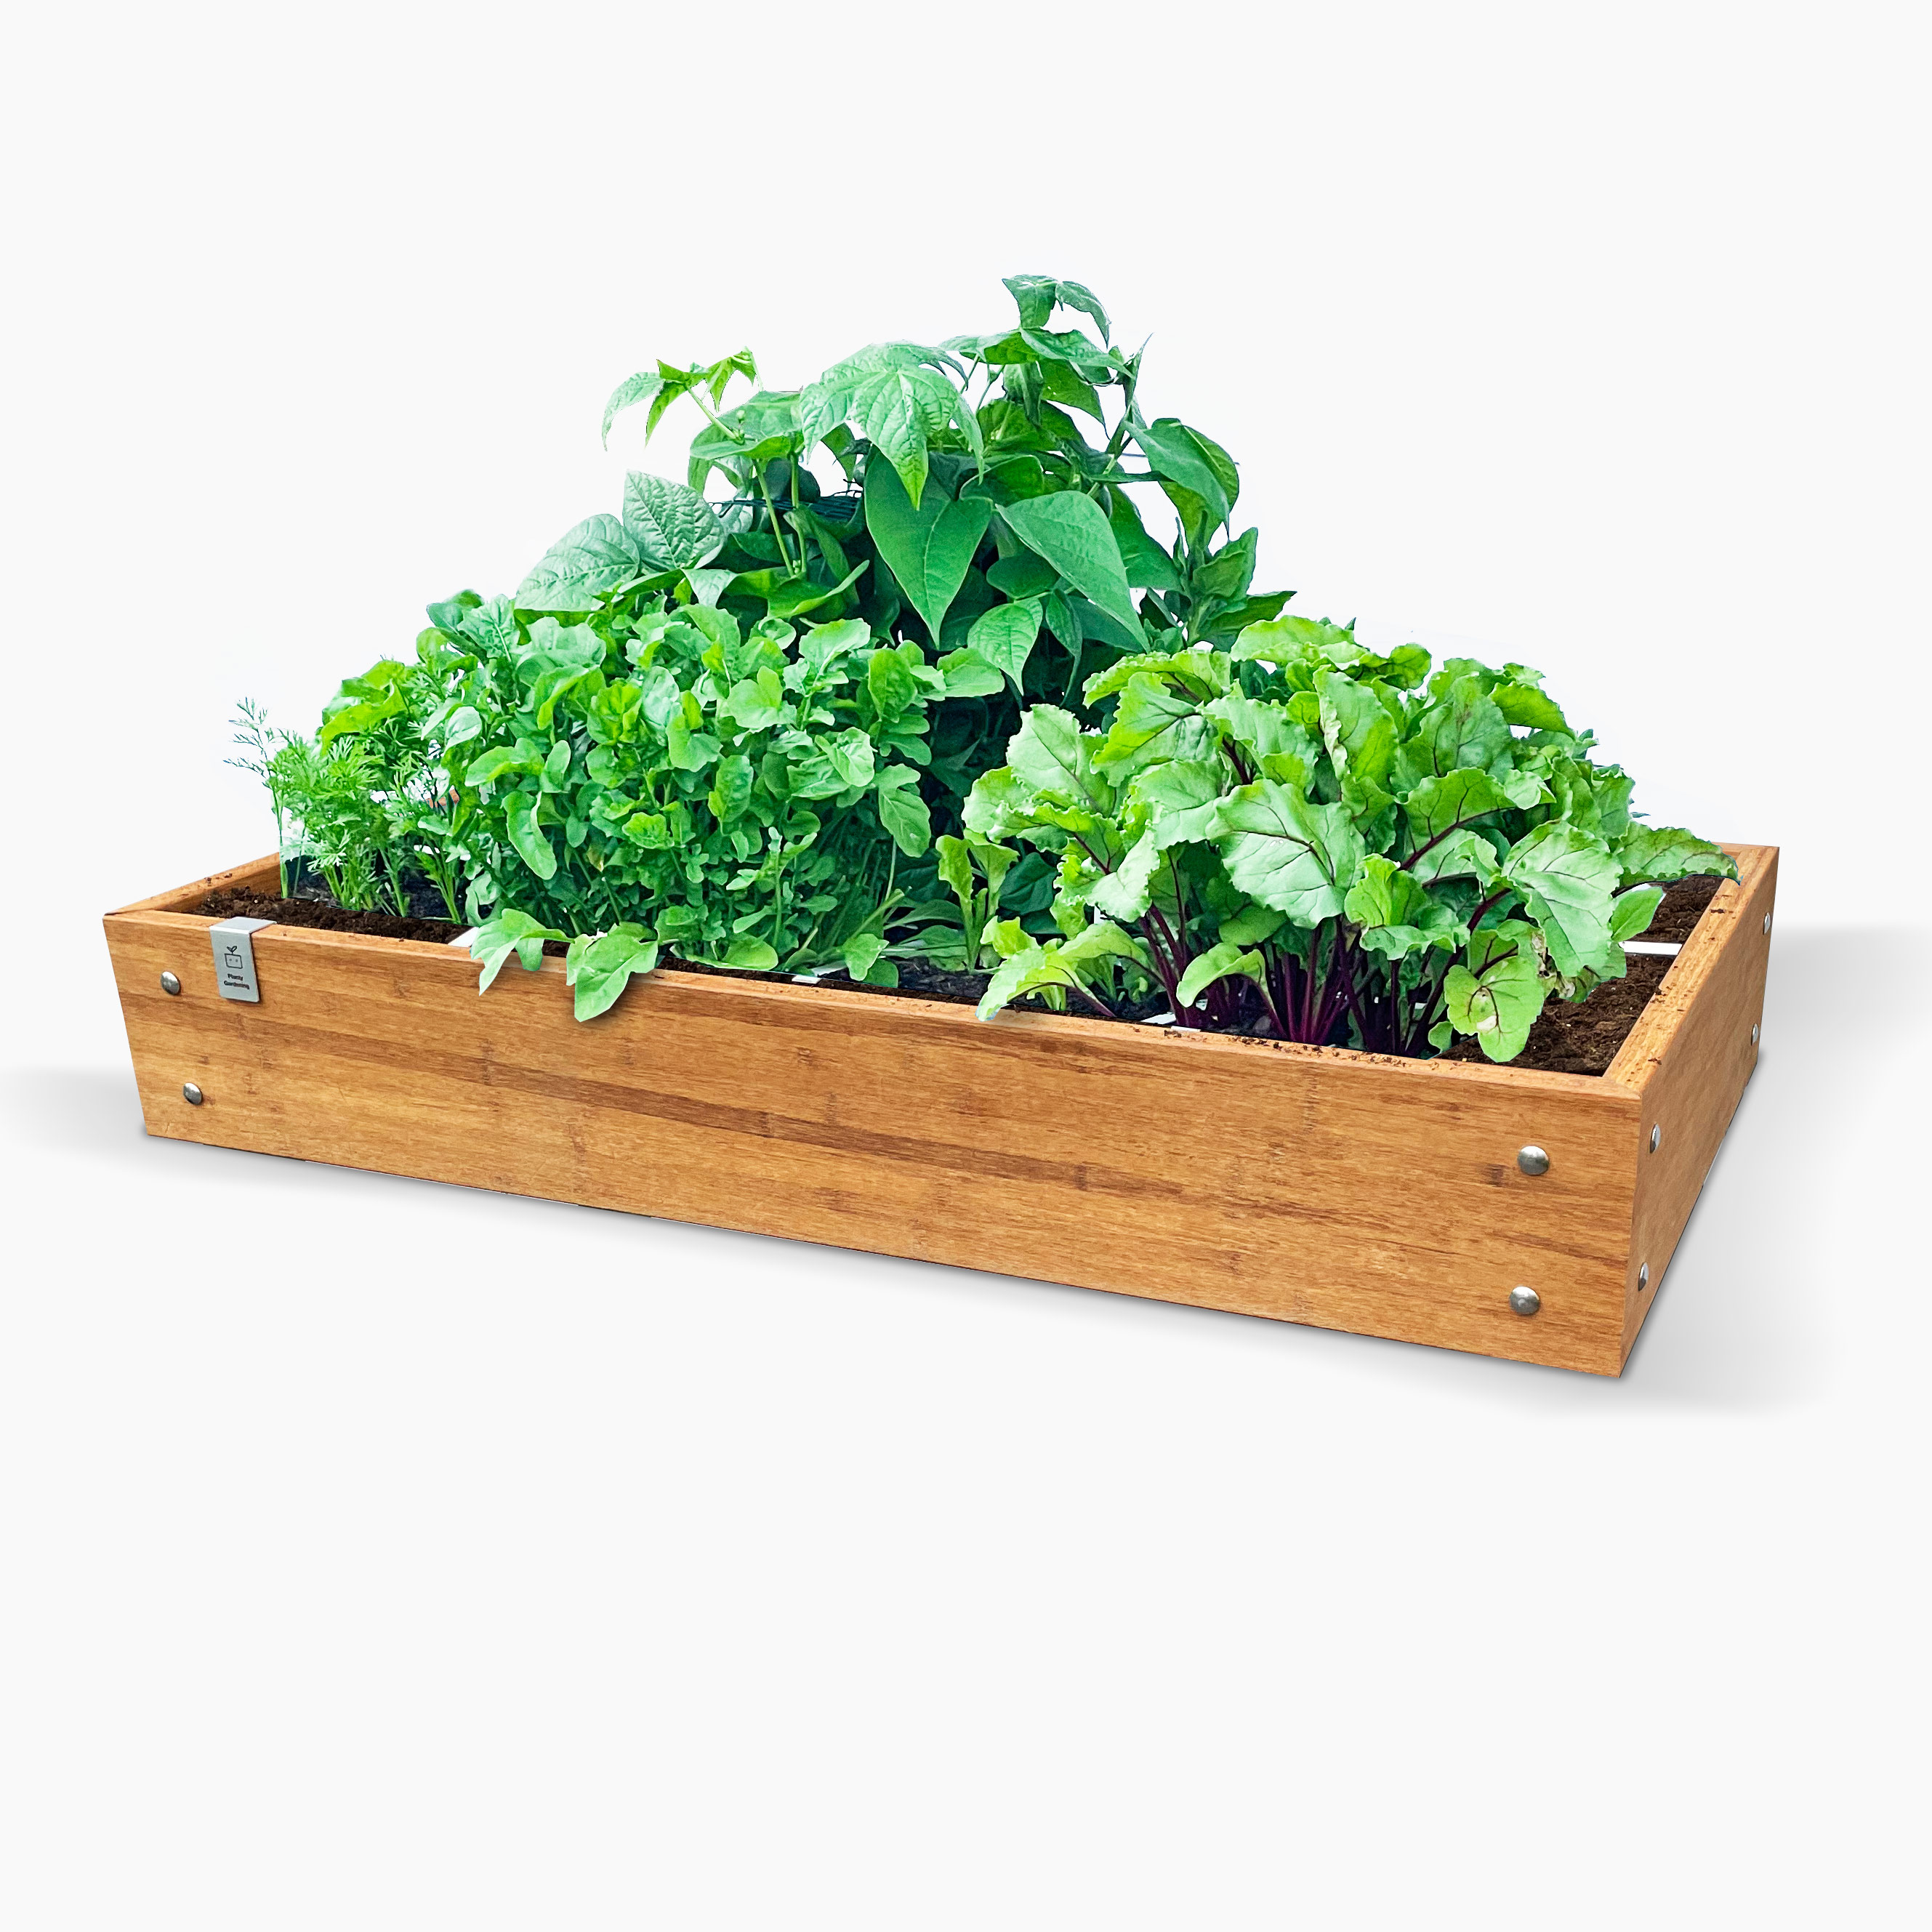 Medium-starter-kit-bamboo-garden-box-60x120_4.jpg